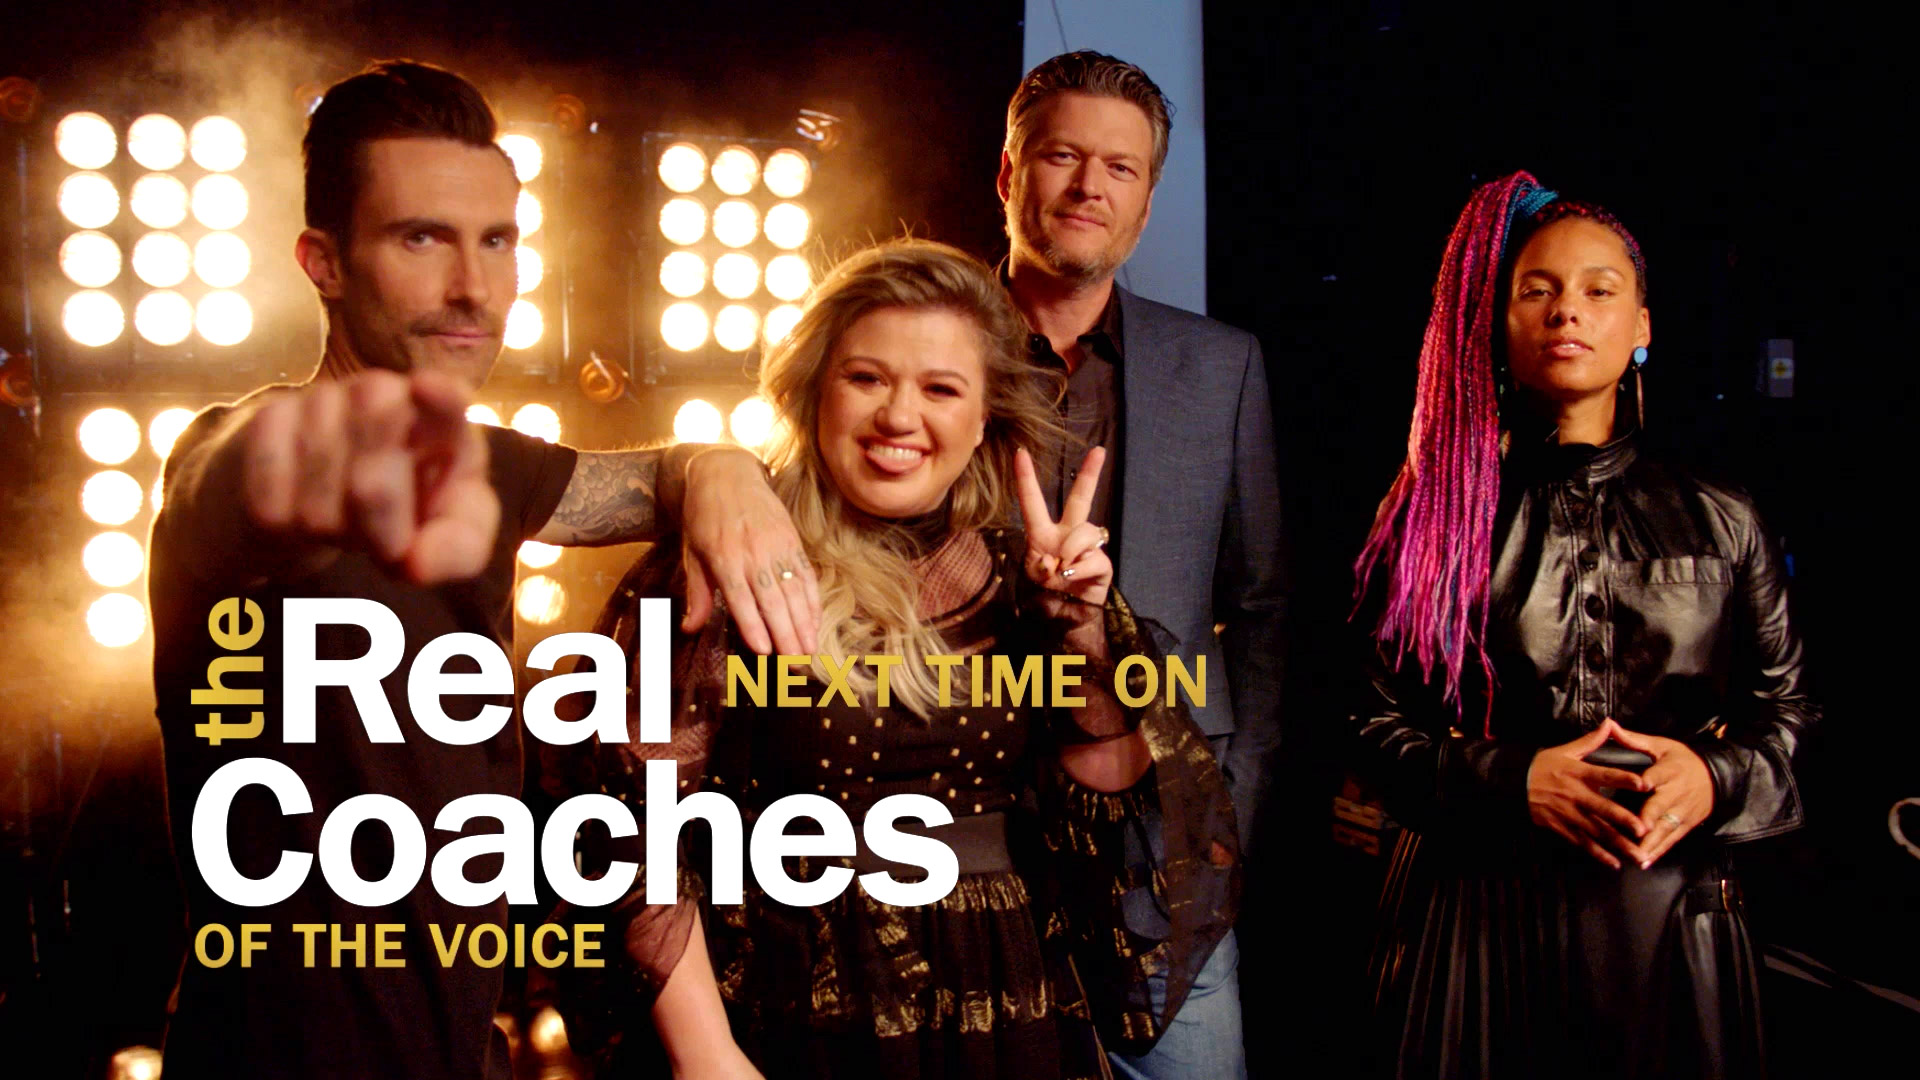 The Voice Season 14 Features Adam Levine and Blake Shelton